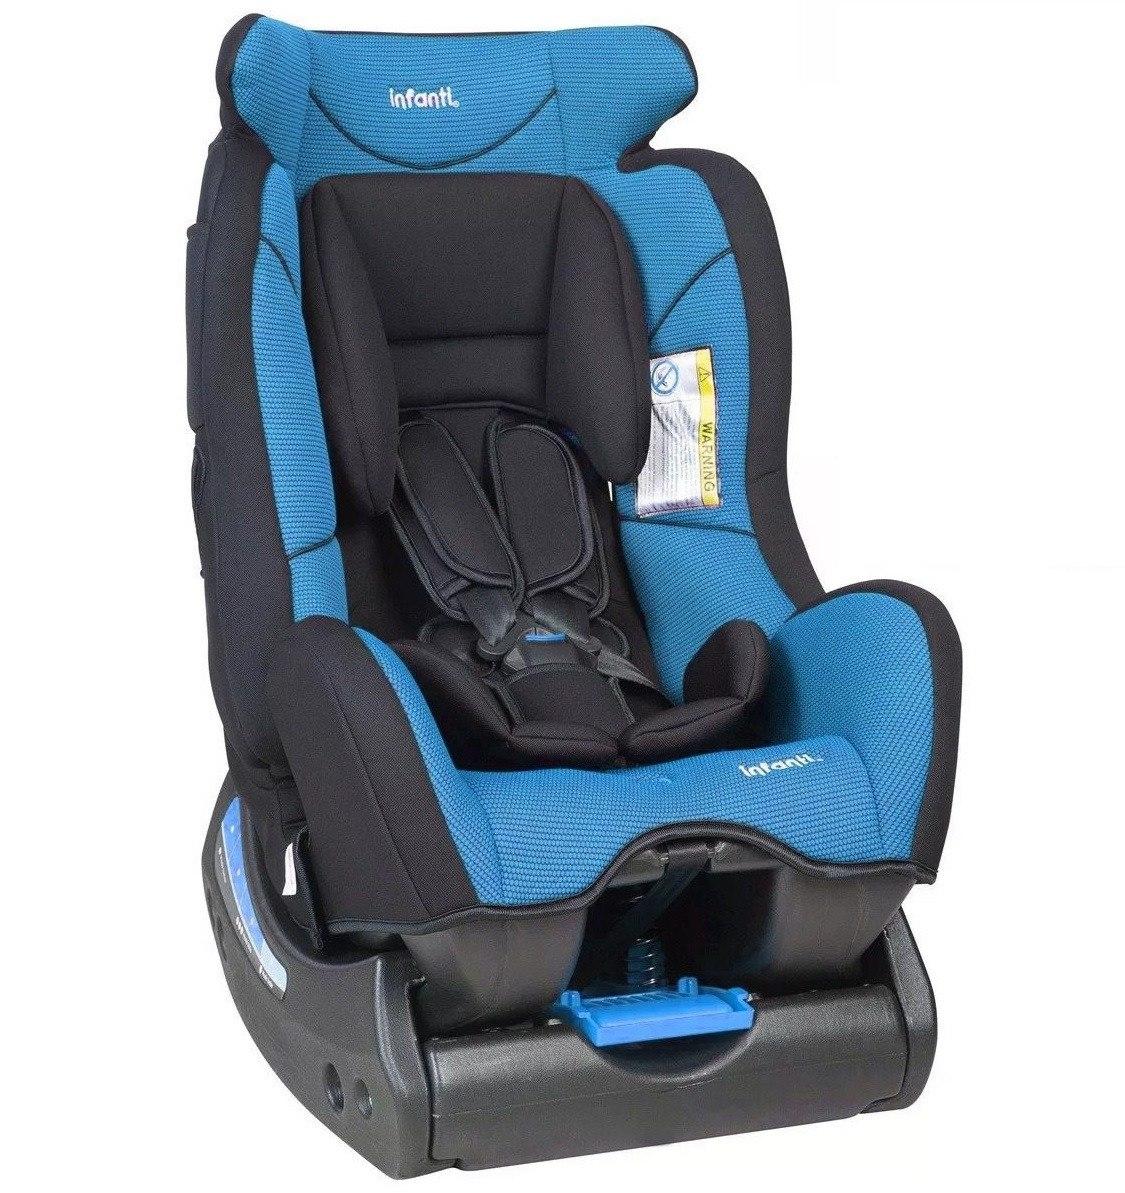 0e87a2290 Silla Para Auto Silla Auto Bebe Infanti S500 Azul - U$S 179,00 en ...